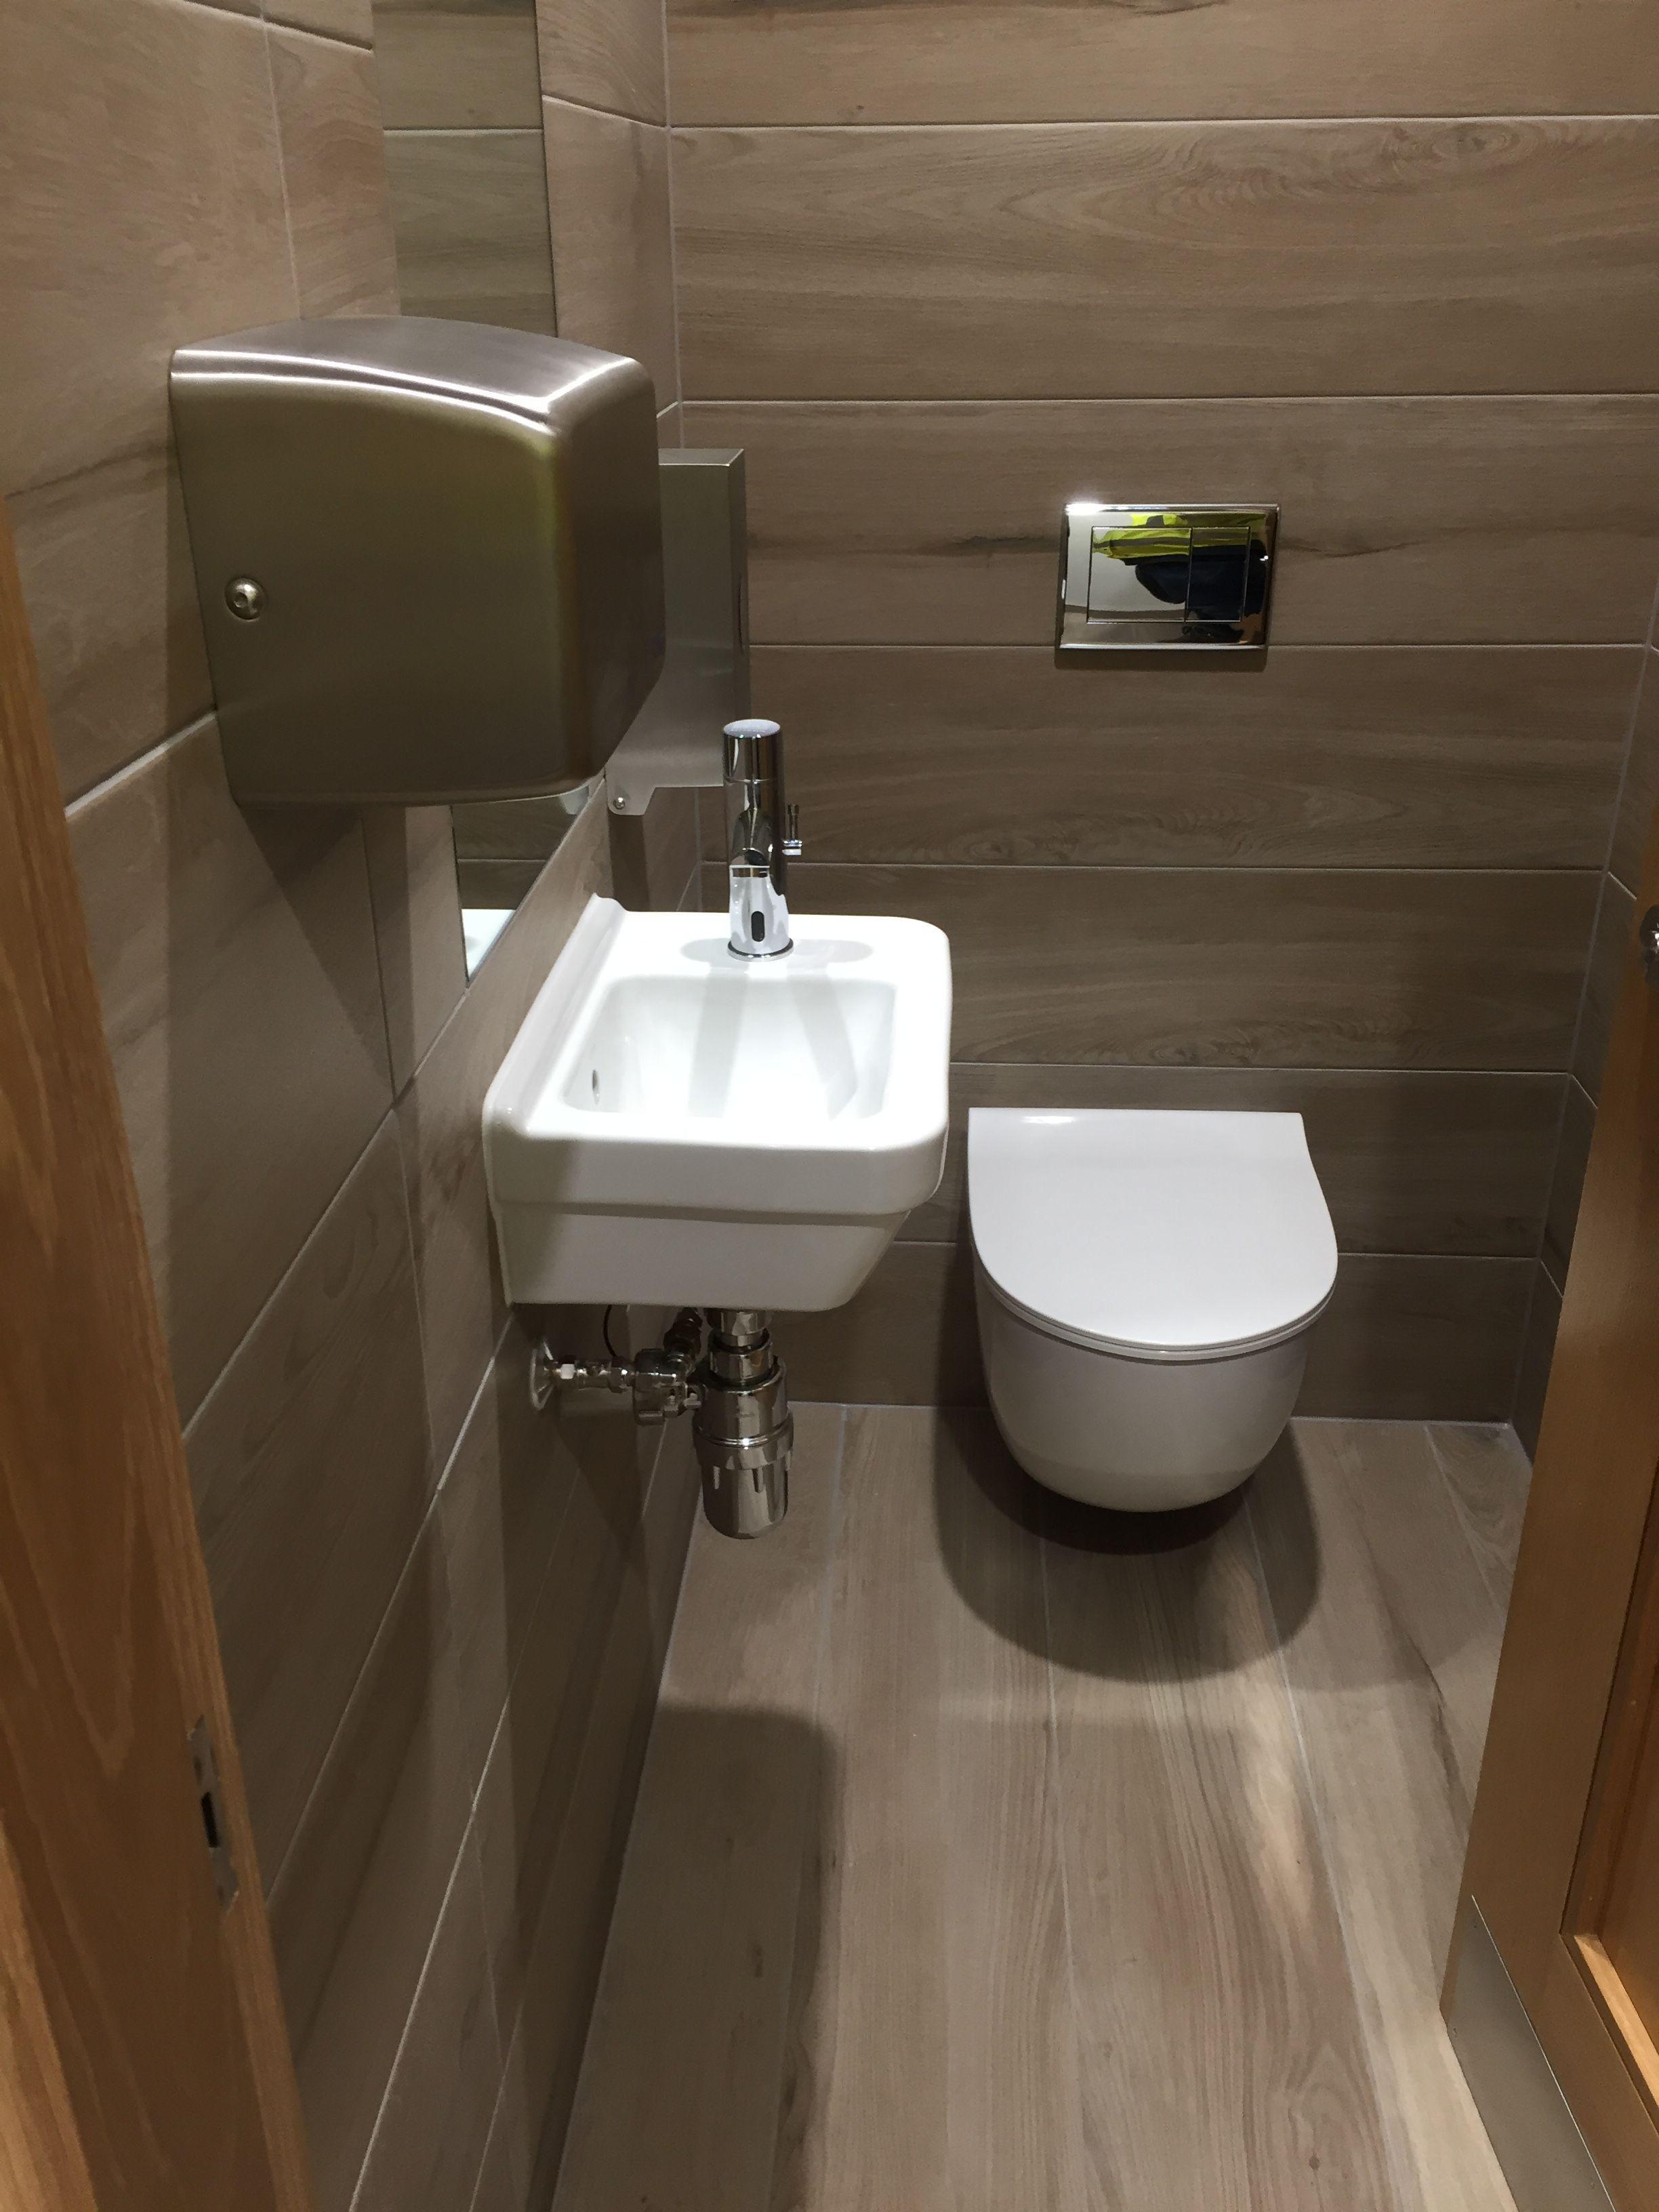 Trendy Faucet At University College Dublin Carysford Ireland Luxurybathroomsire Bathroom Design Inspiration Bathroom Design Small Modern Small Half Bathrooms